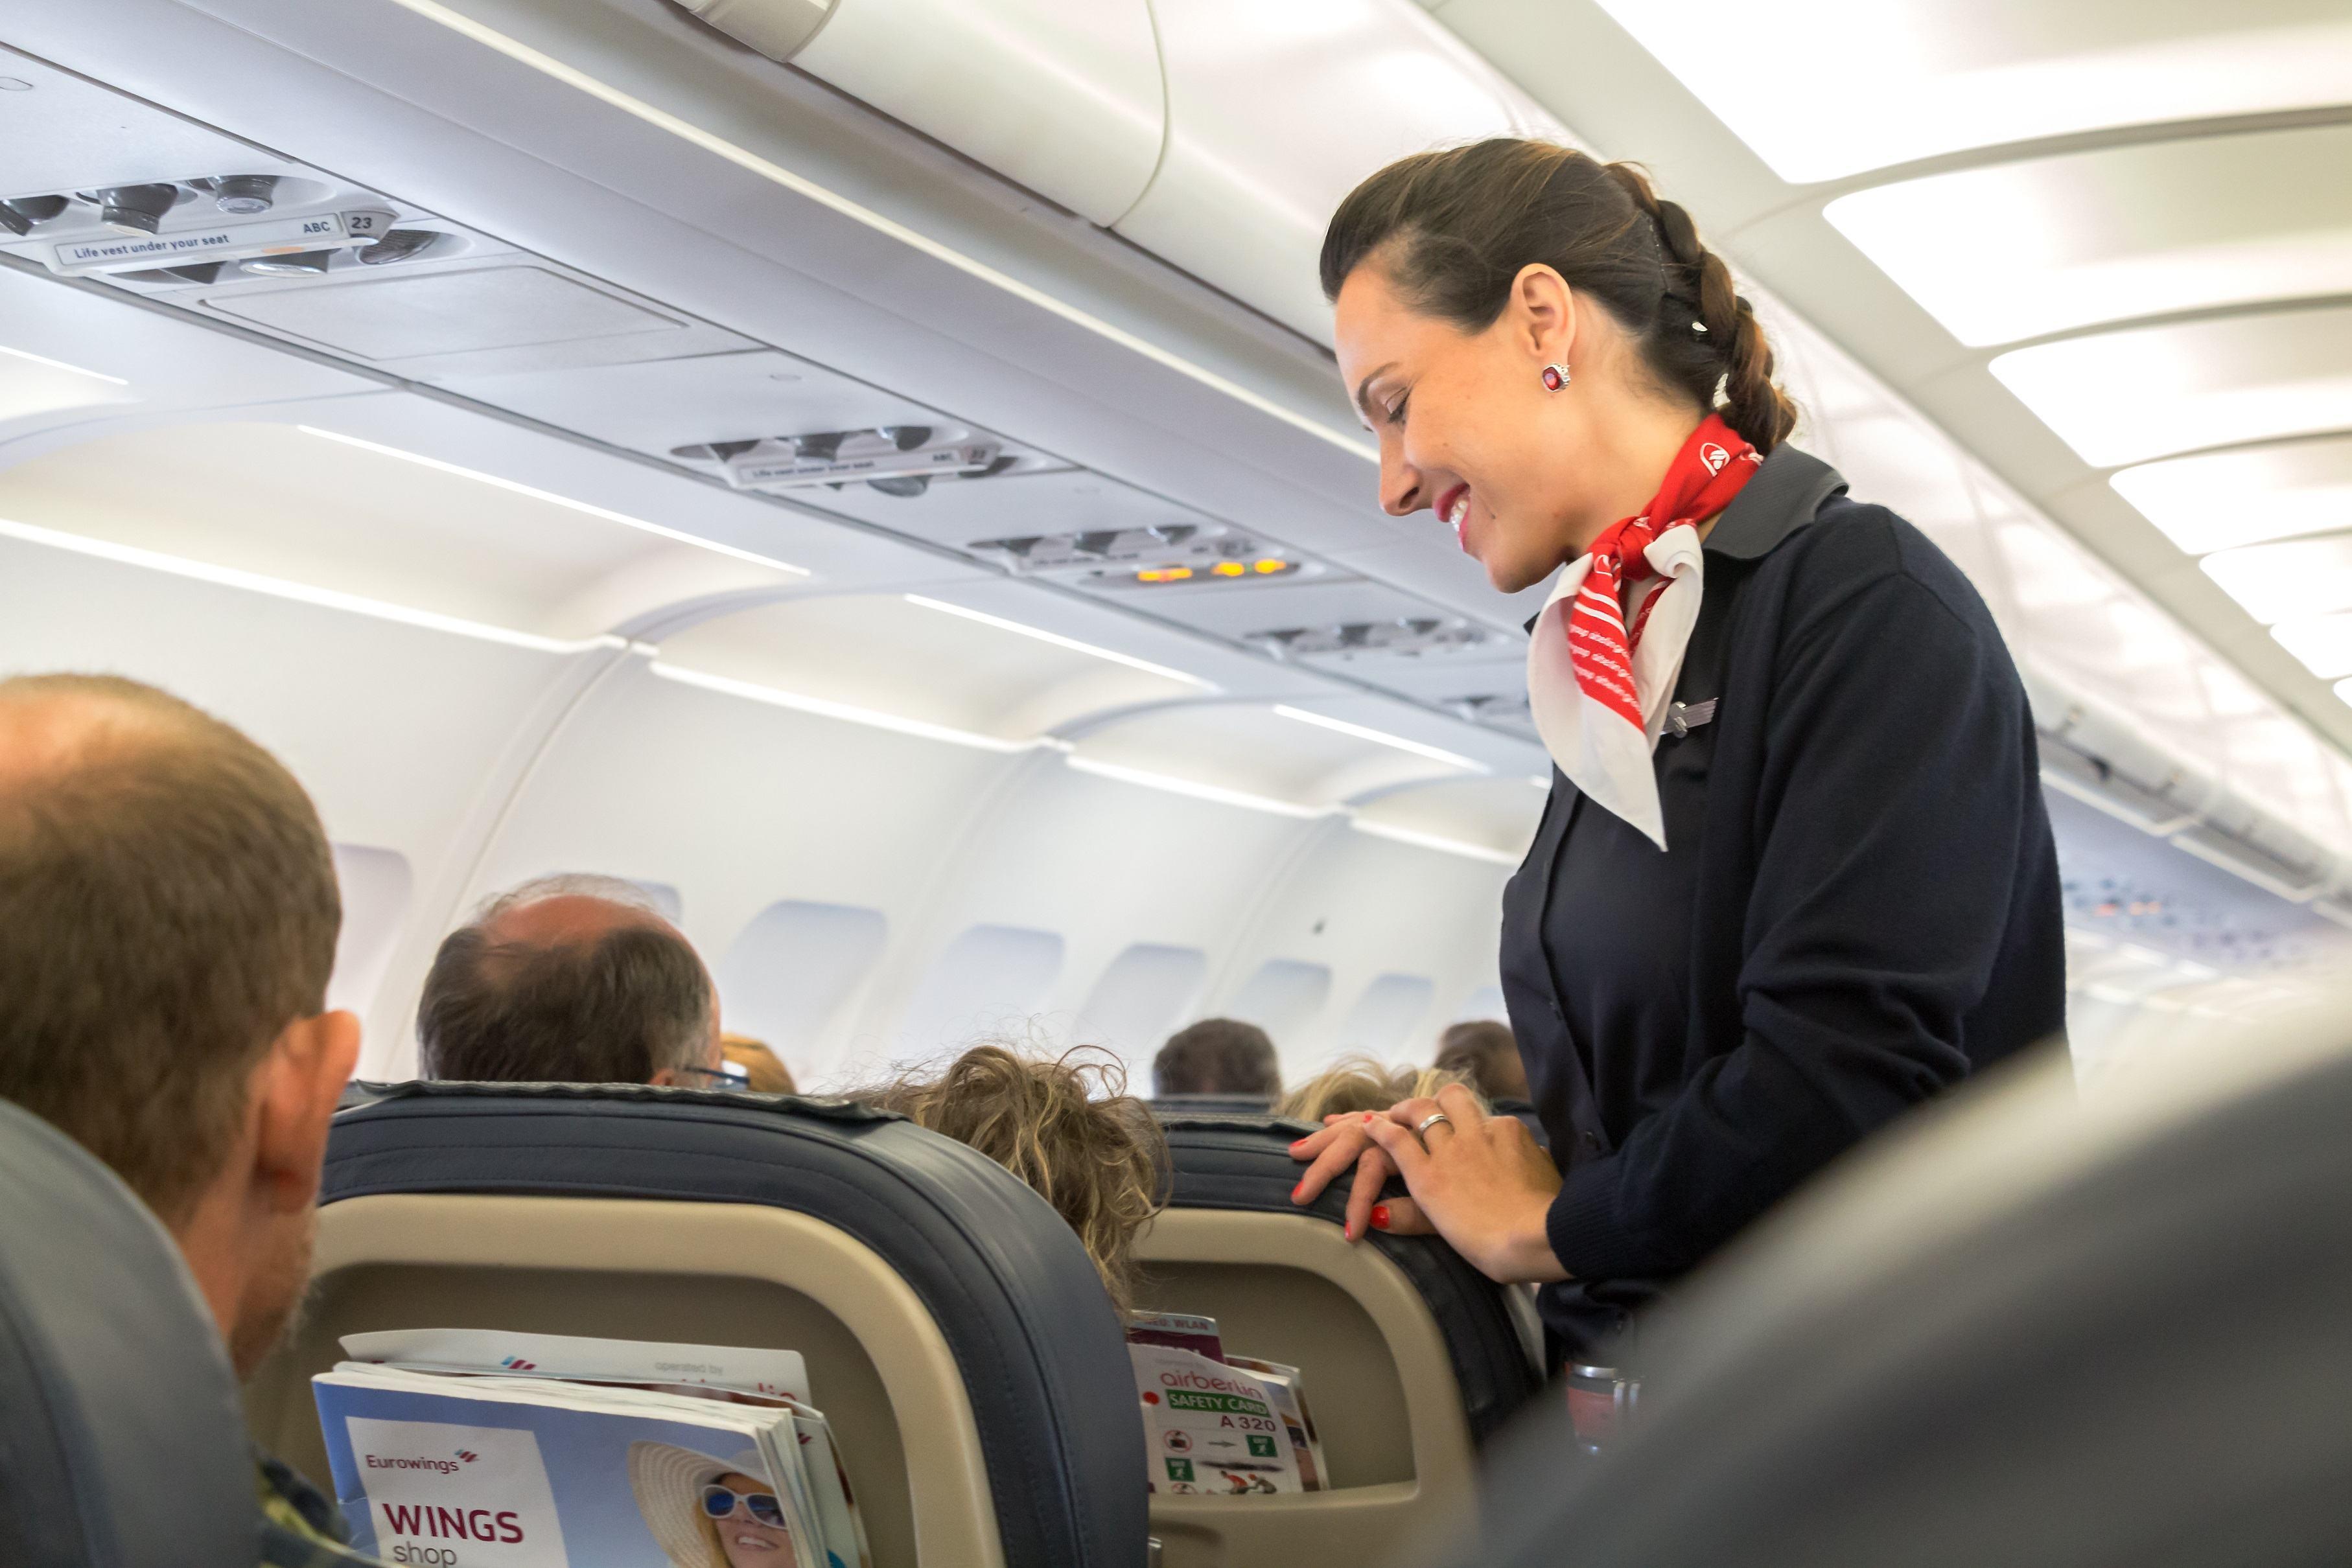 Stewardess talking to passenger